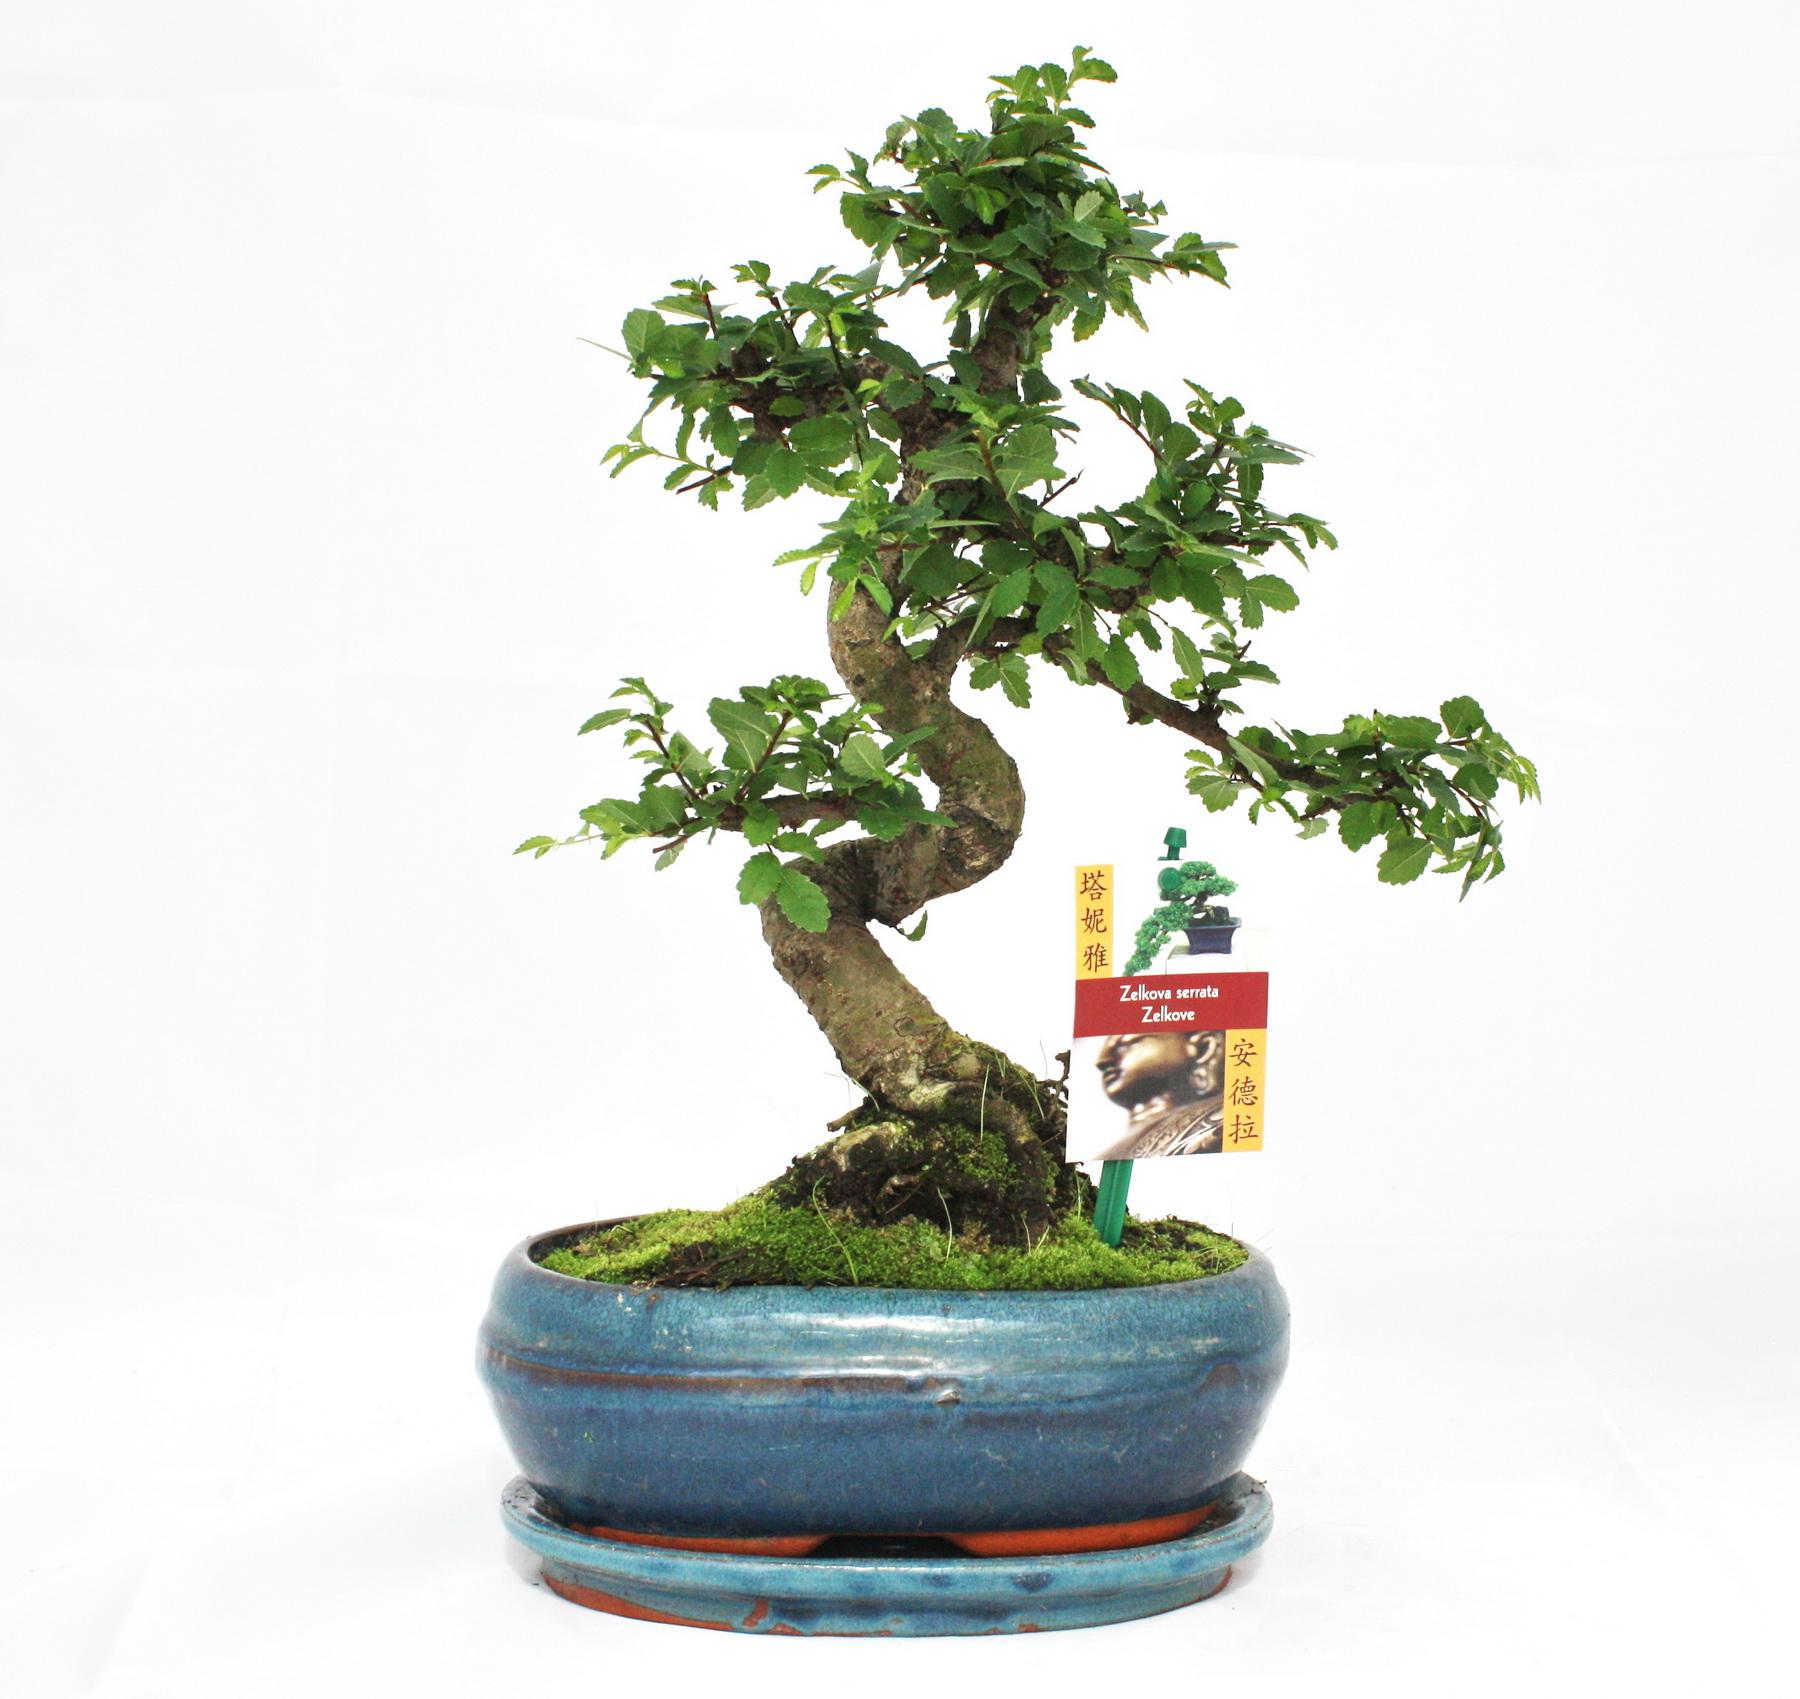 bonsai chinesische ulme ulmus parviflora ca 8 jahre. Black Bedroom Furniture Sets. Home Design Ideas